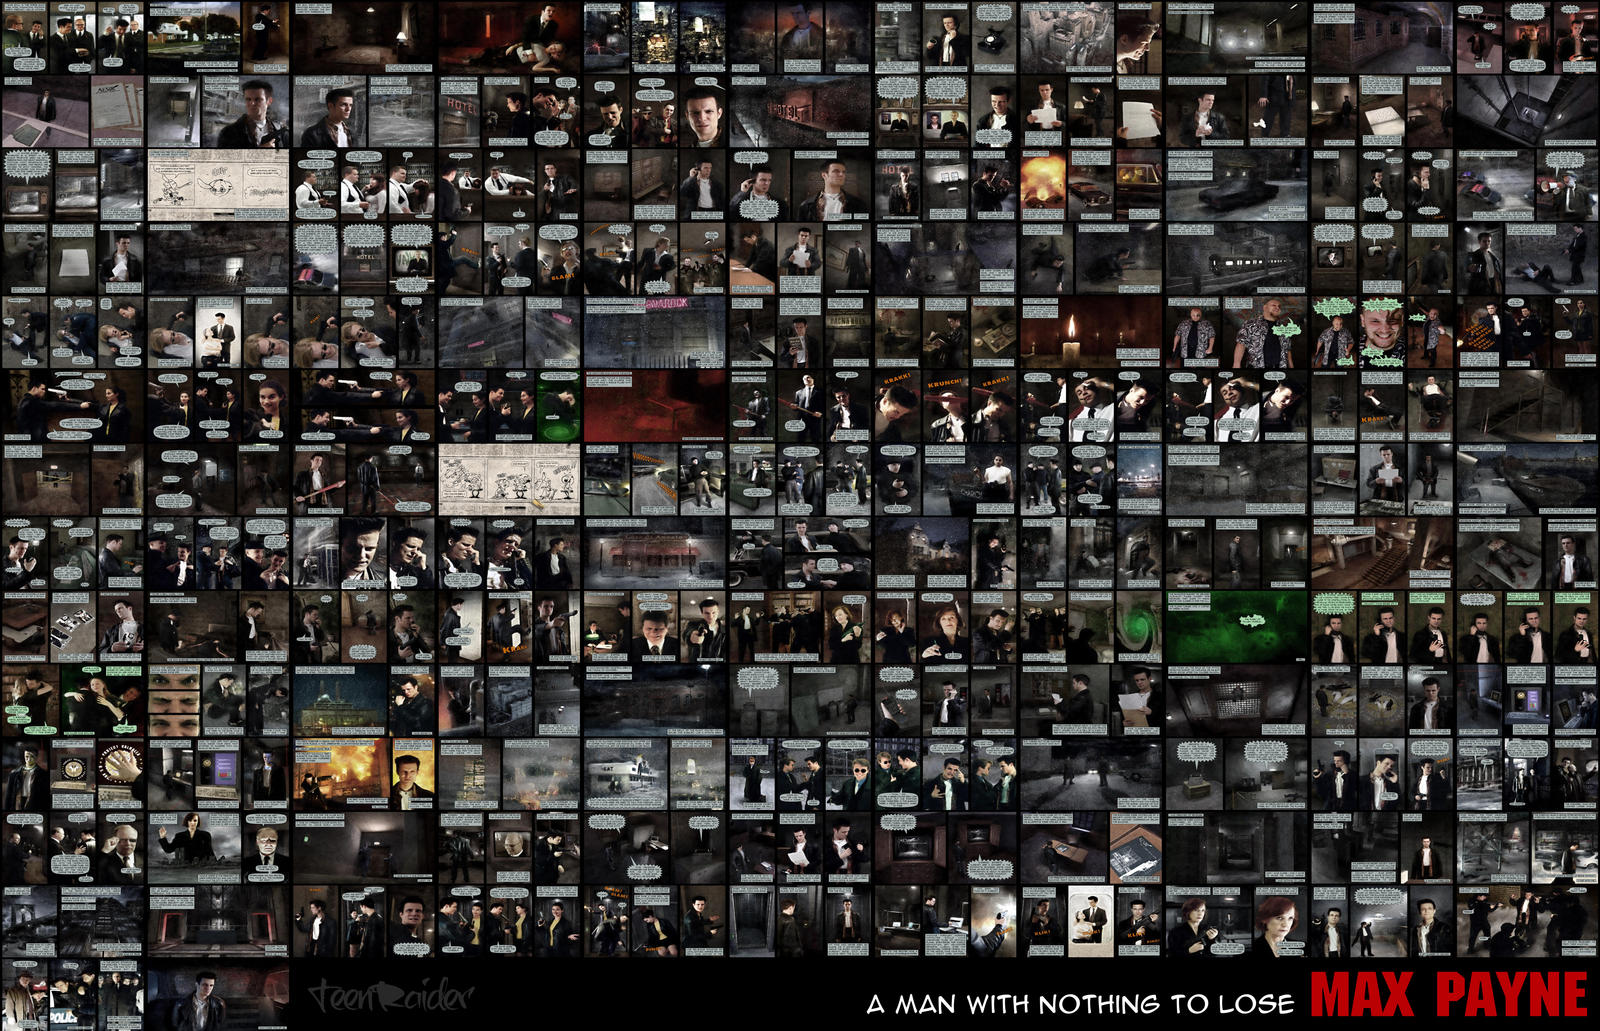 Max Payne - Timeline by TeenRaider